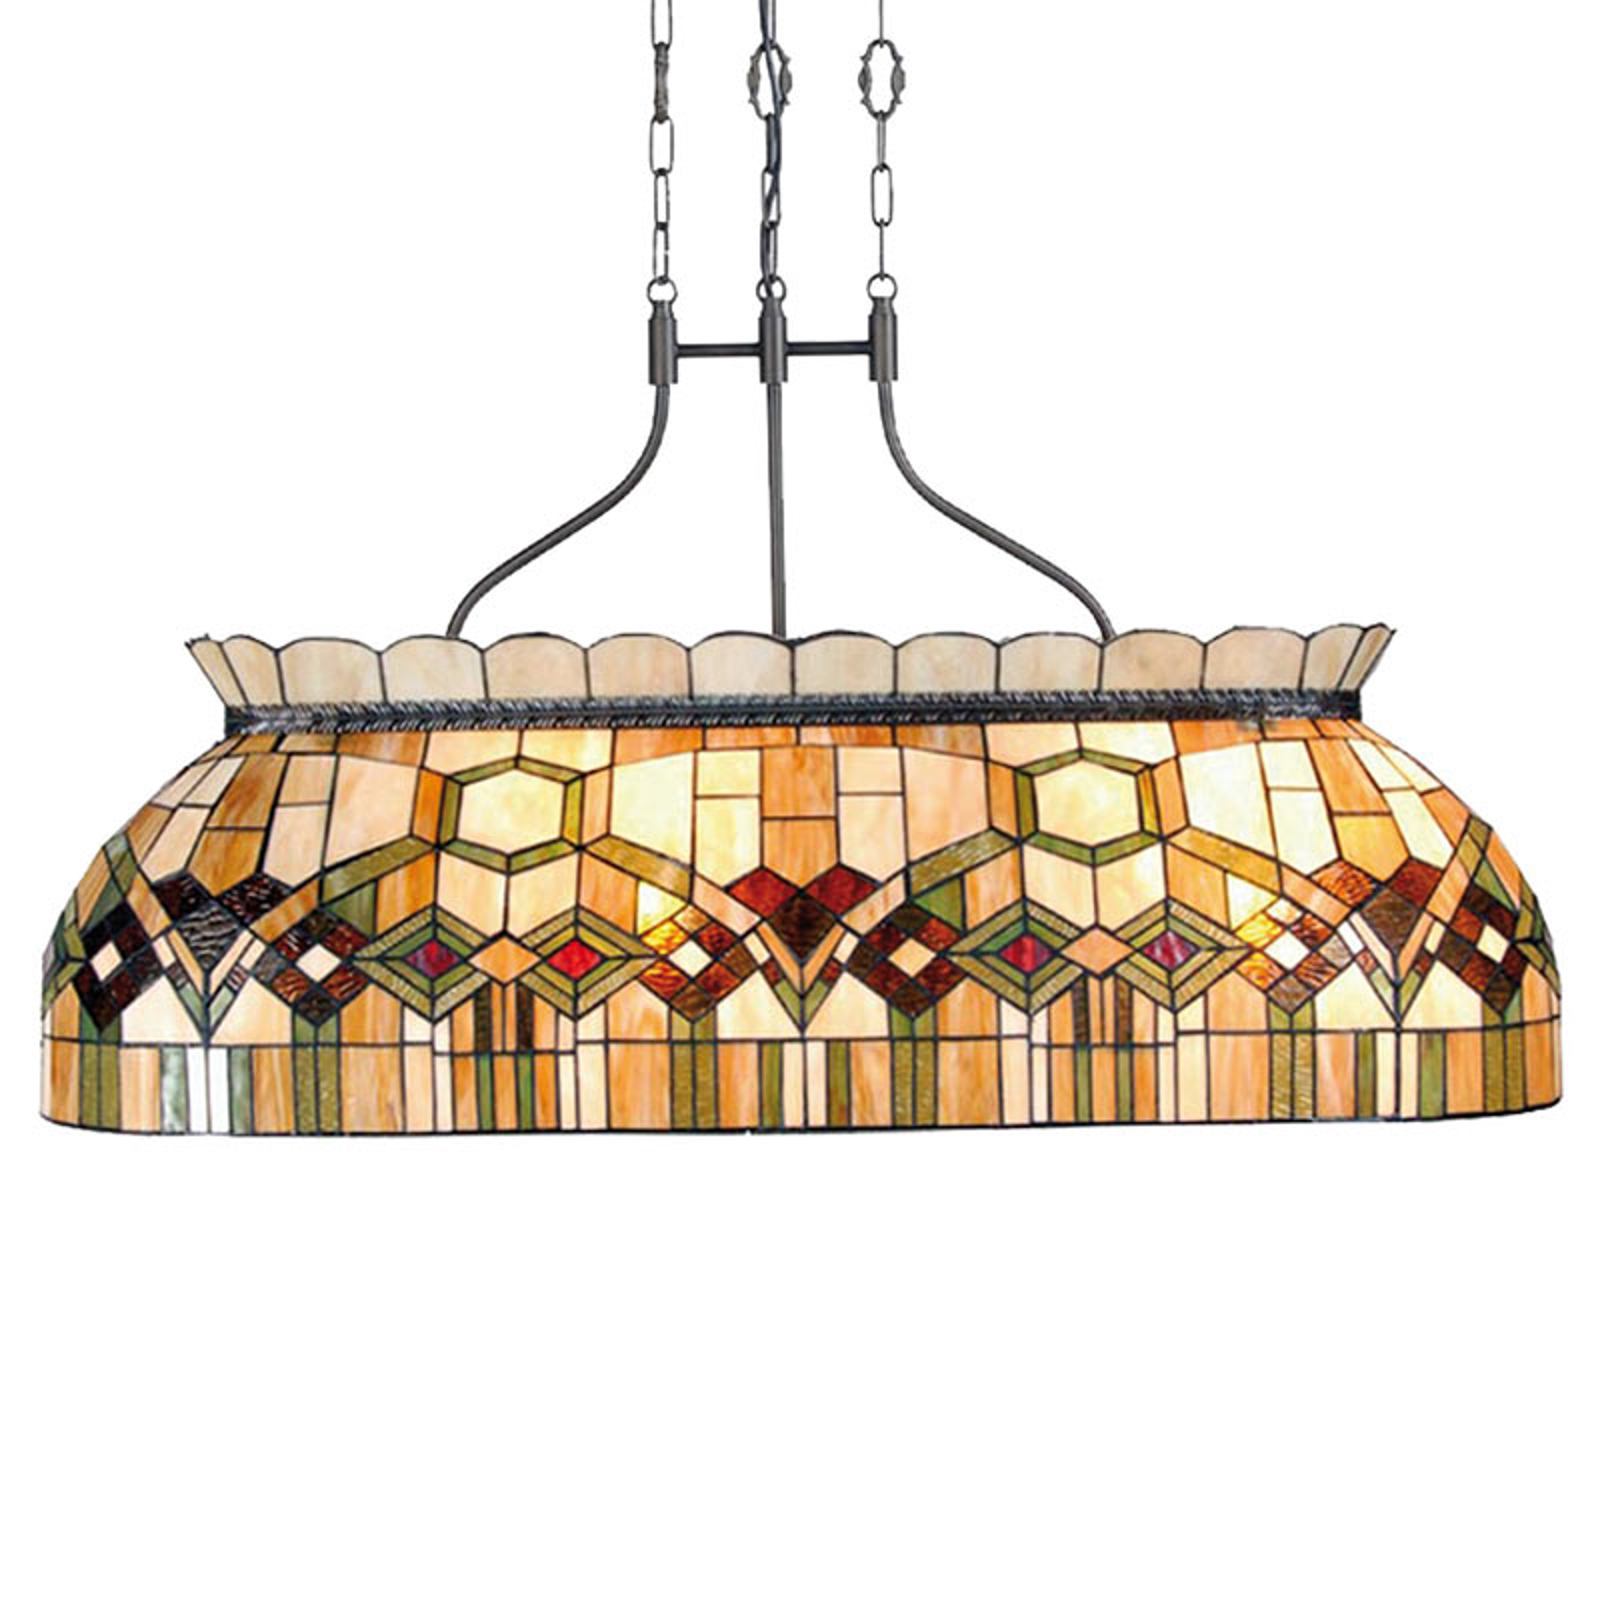 Lampada a sospensione Saavik da 115 cm - Tiffany